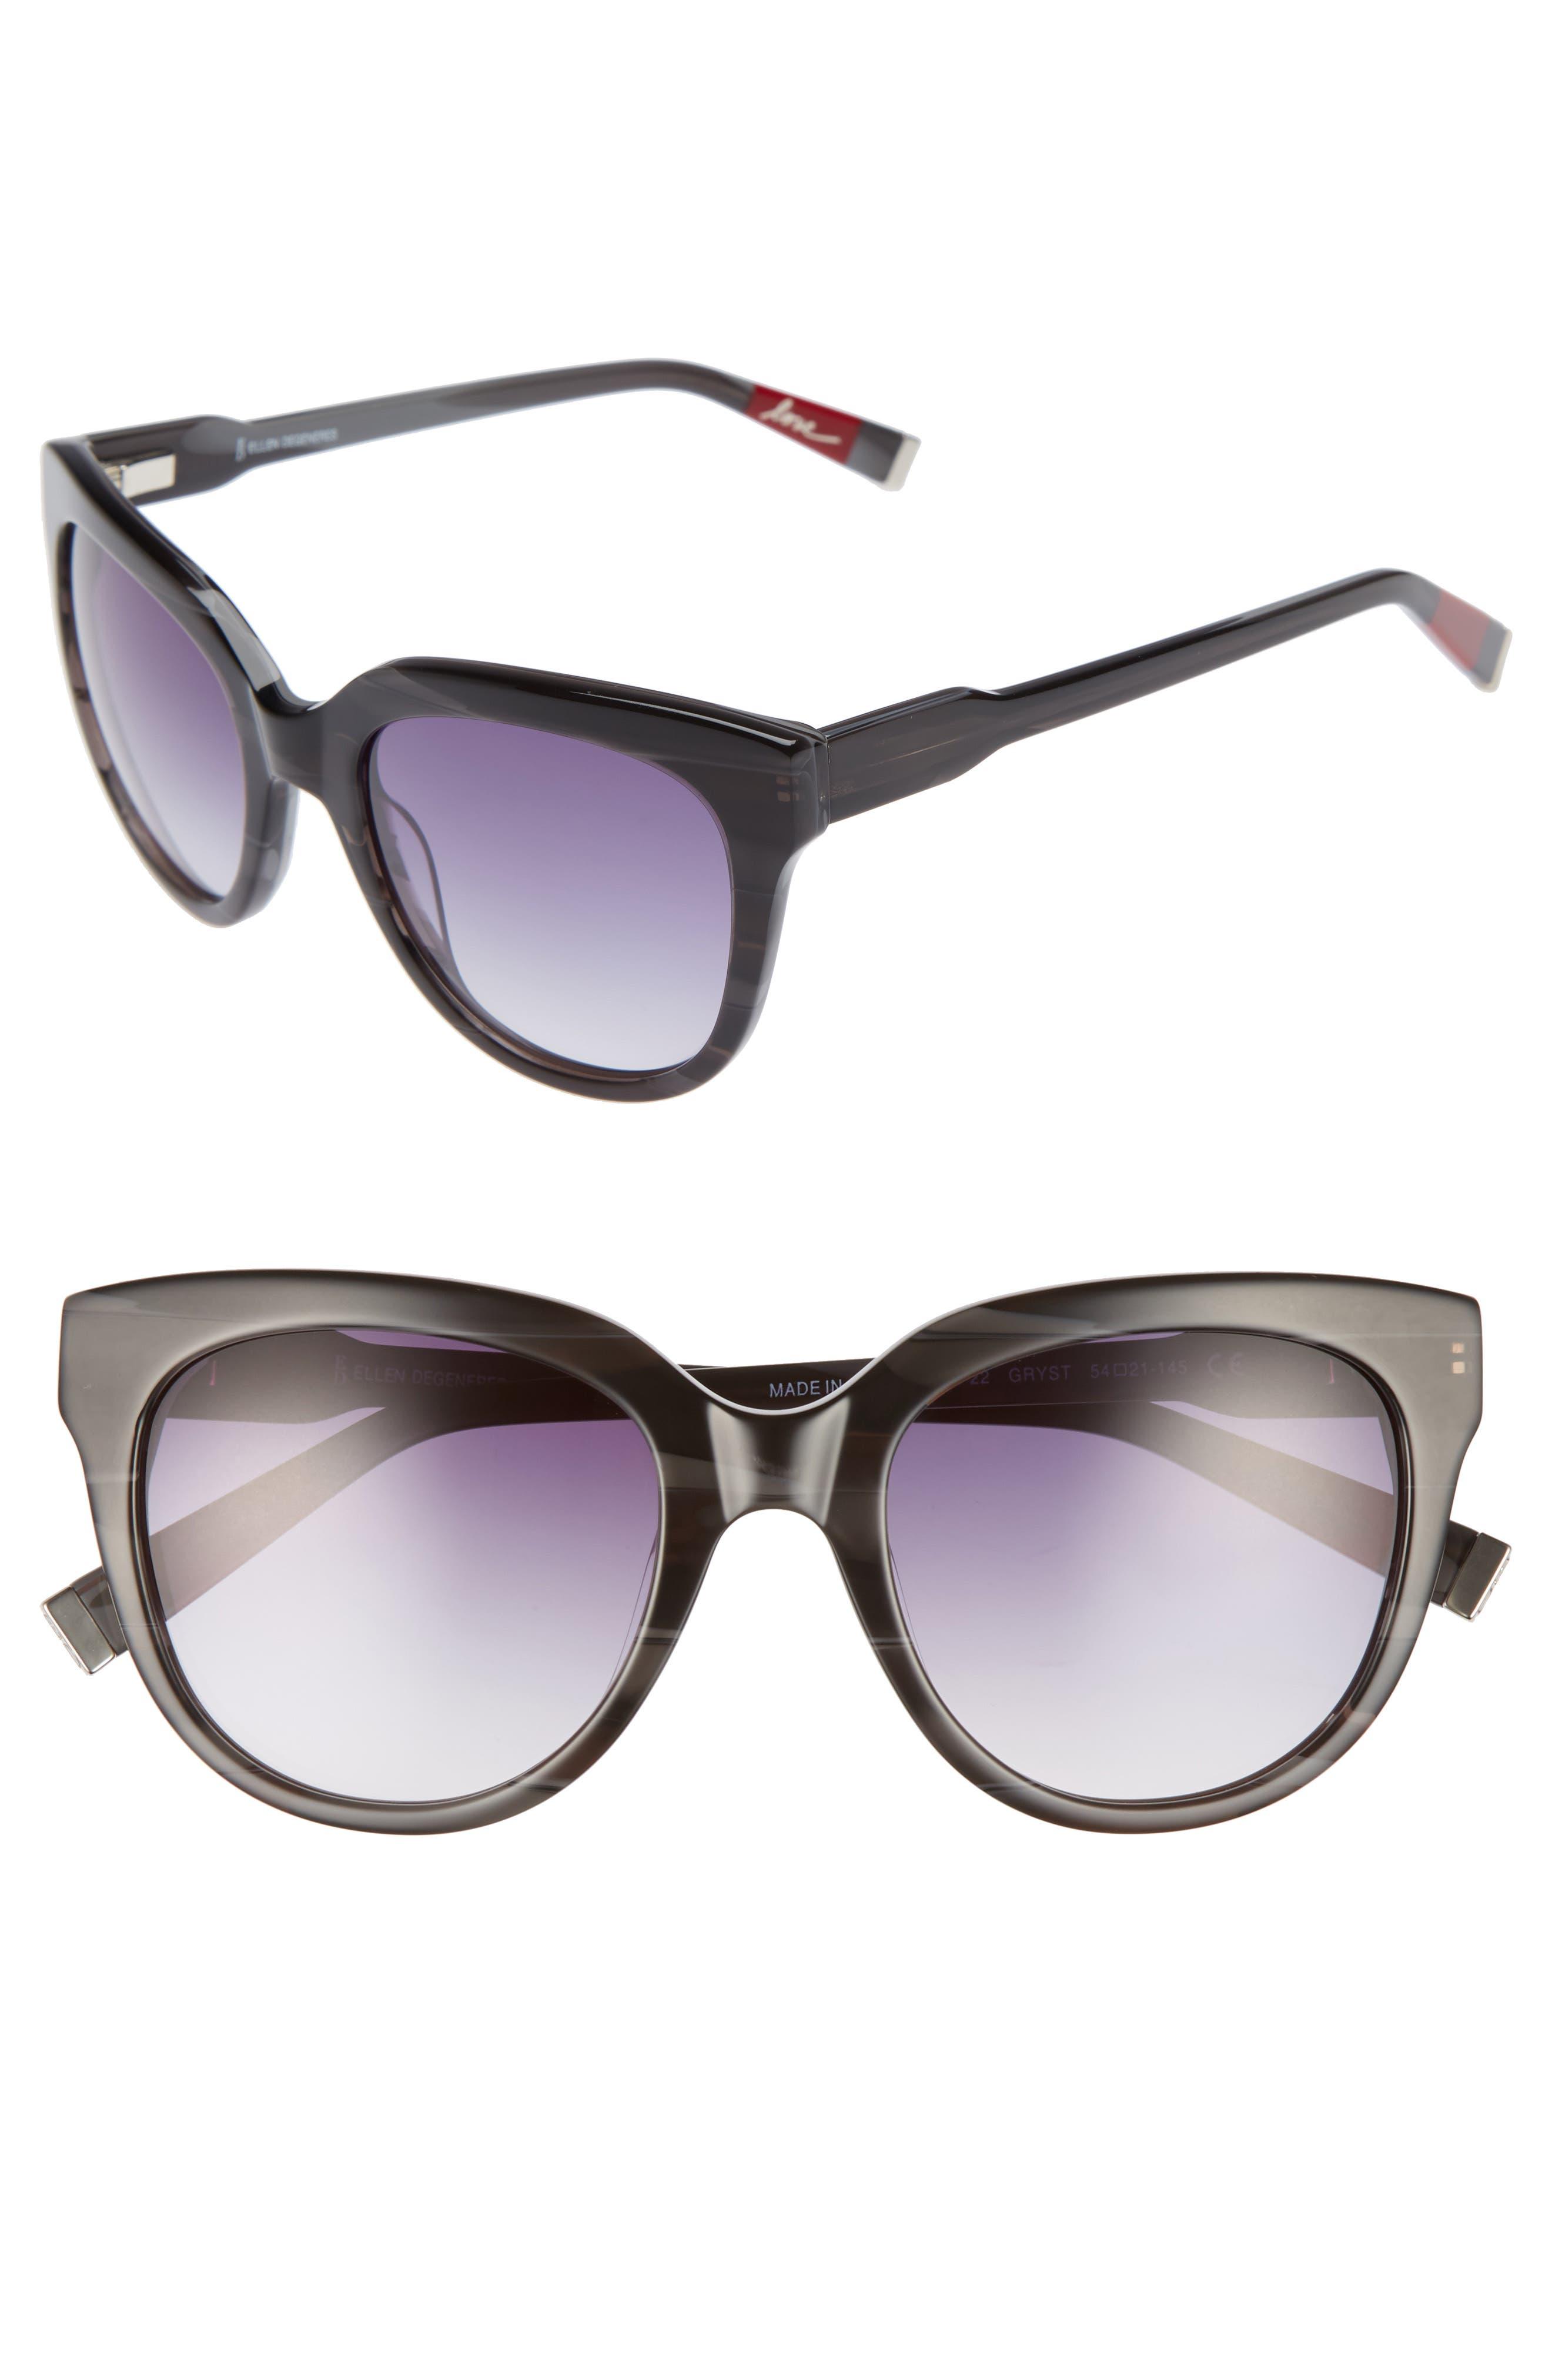 54mm Oval Sunglasses,                         Main,                         color, GREY STRIPE